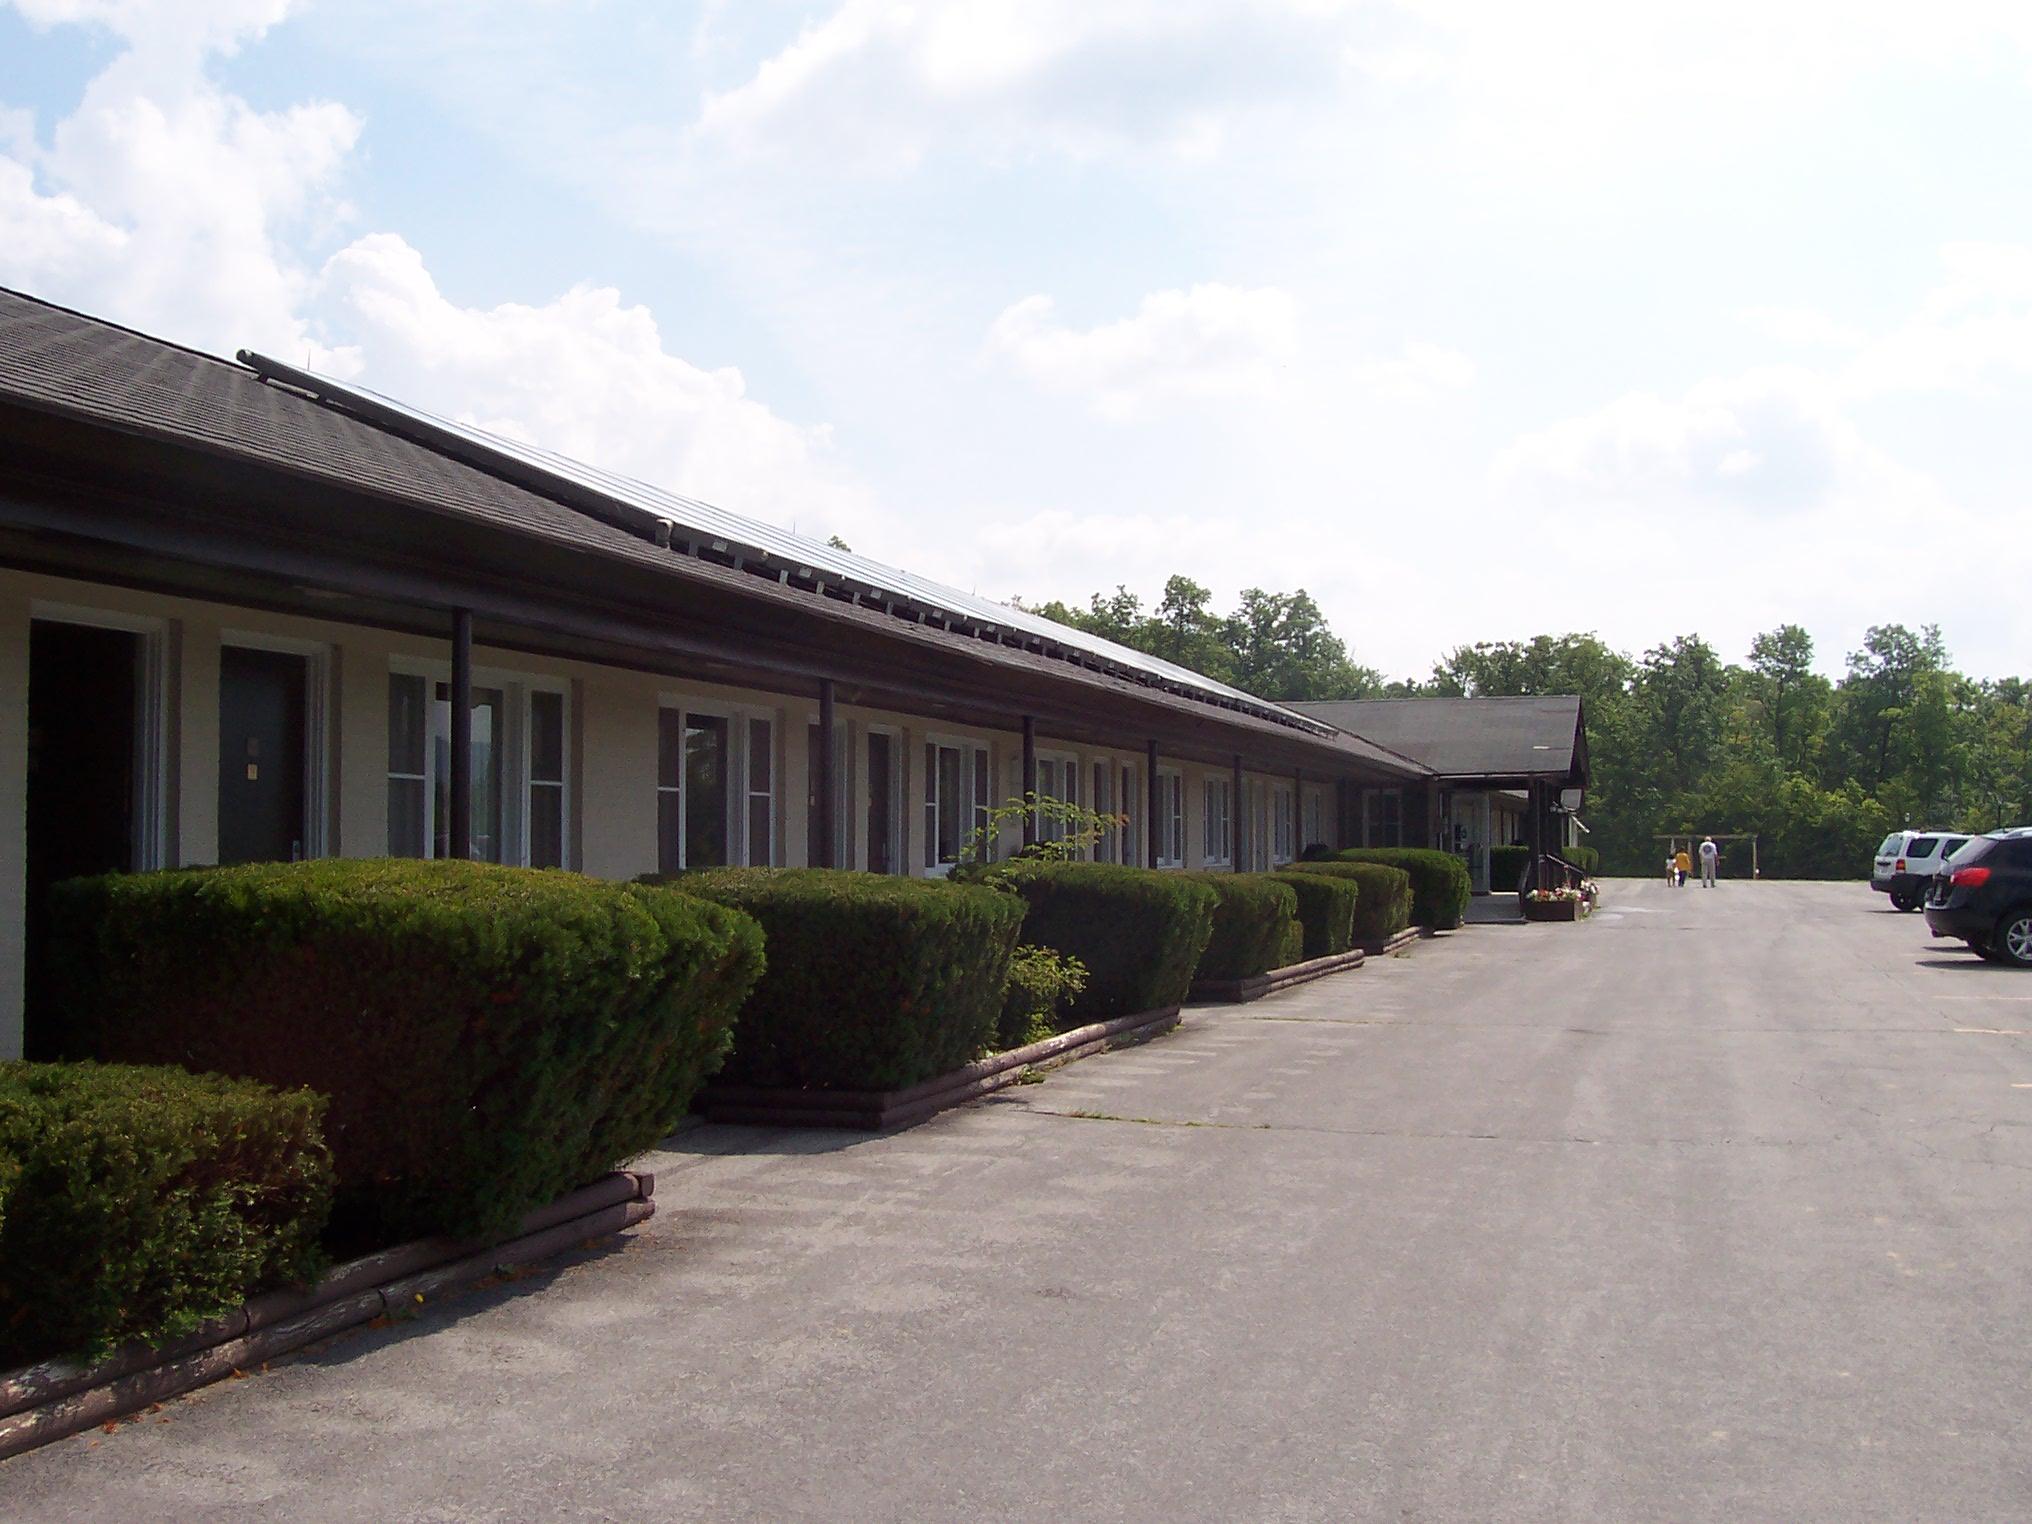 Howe Caverns Motel